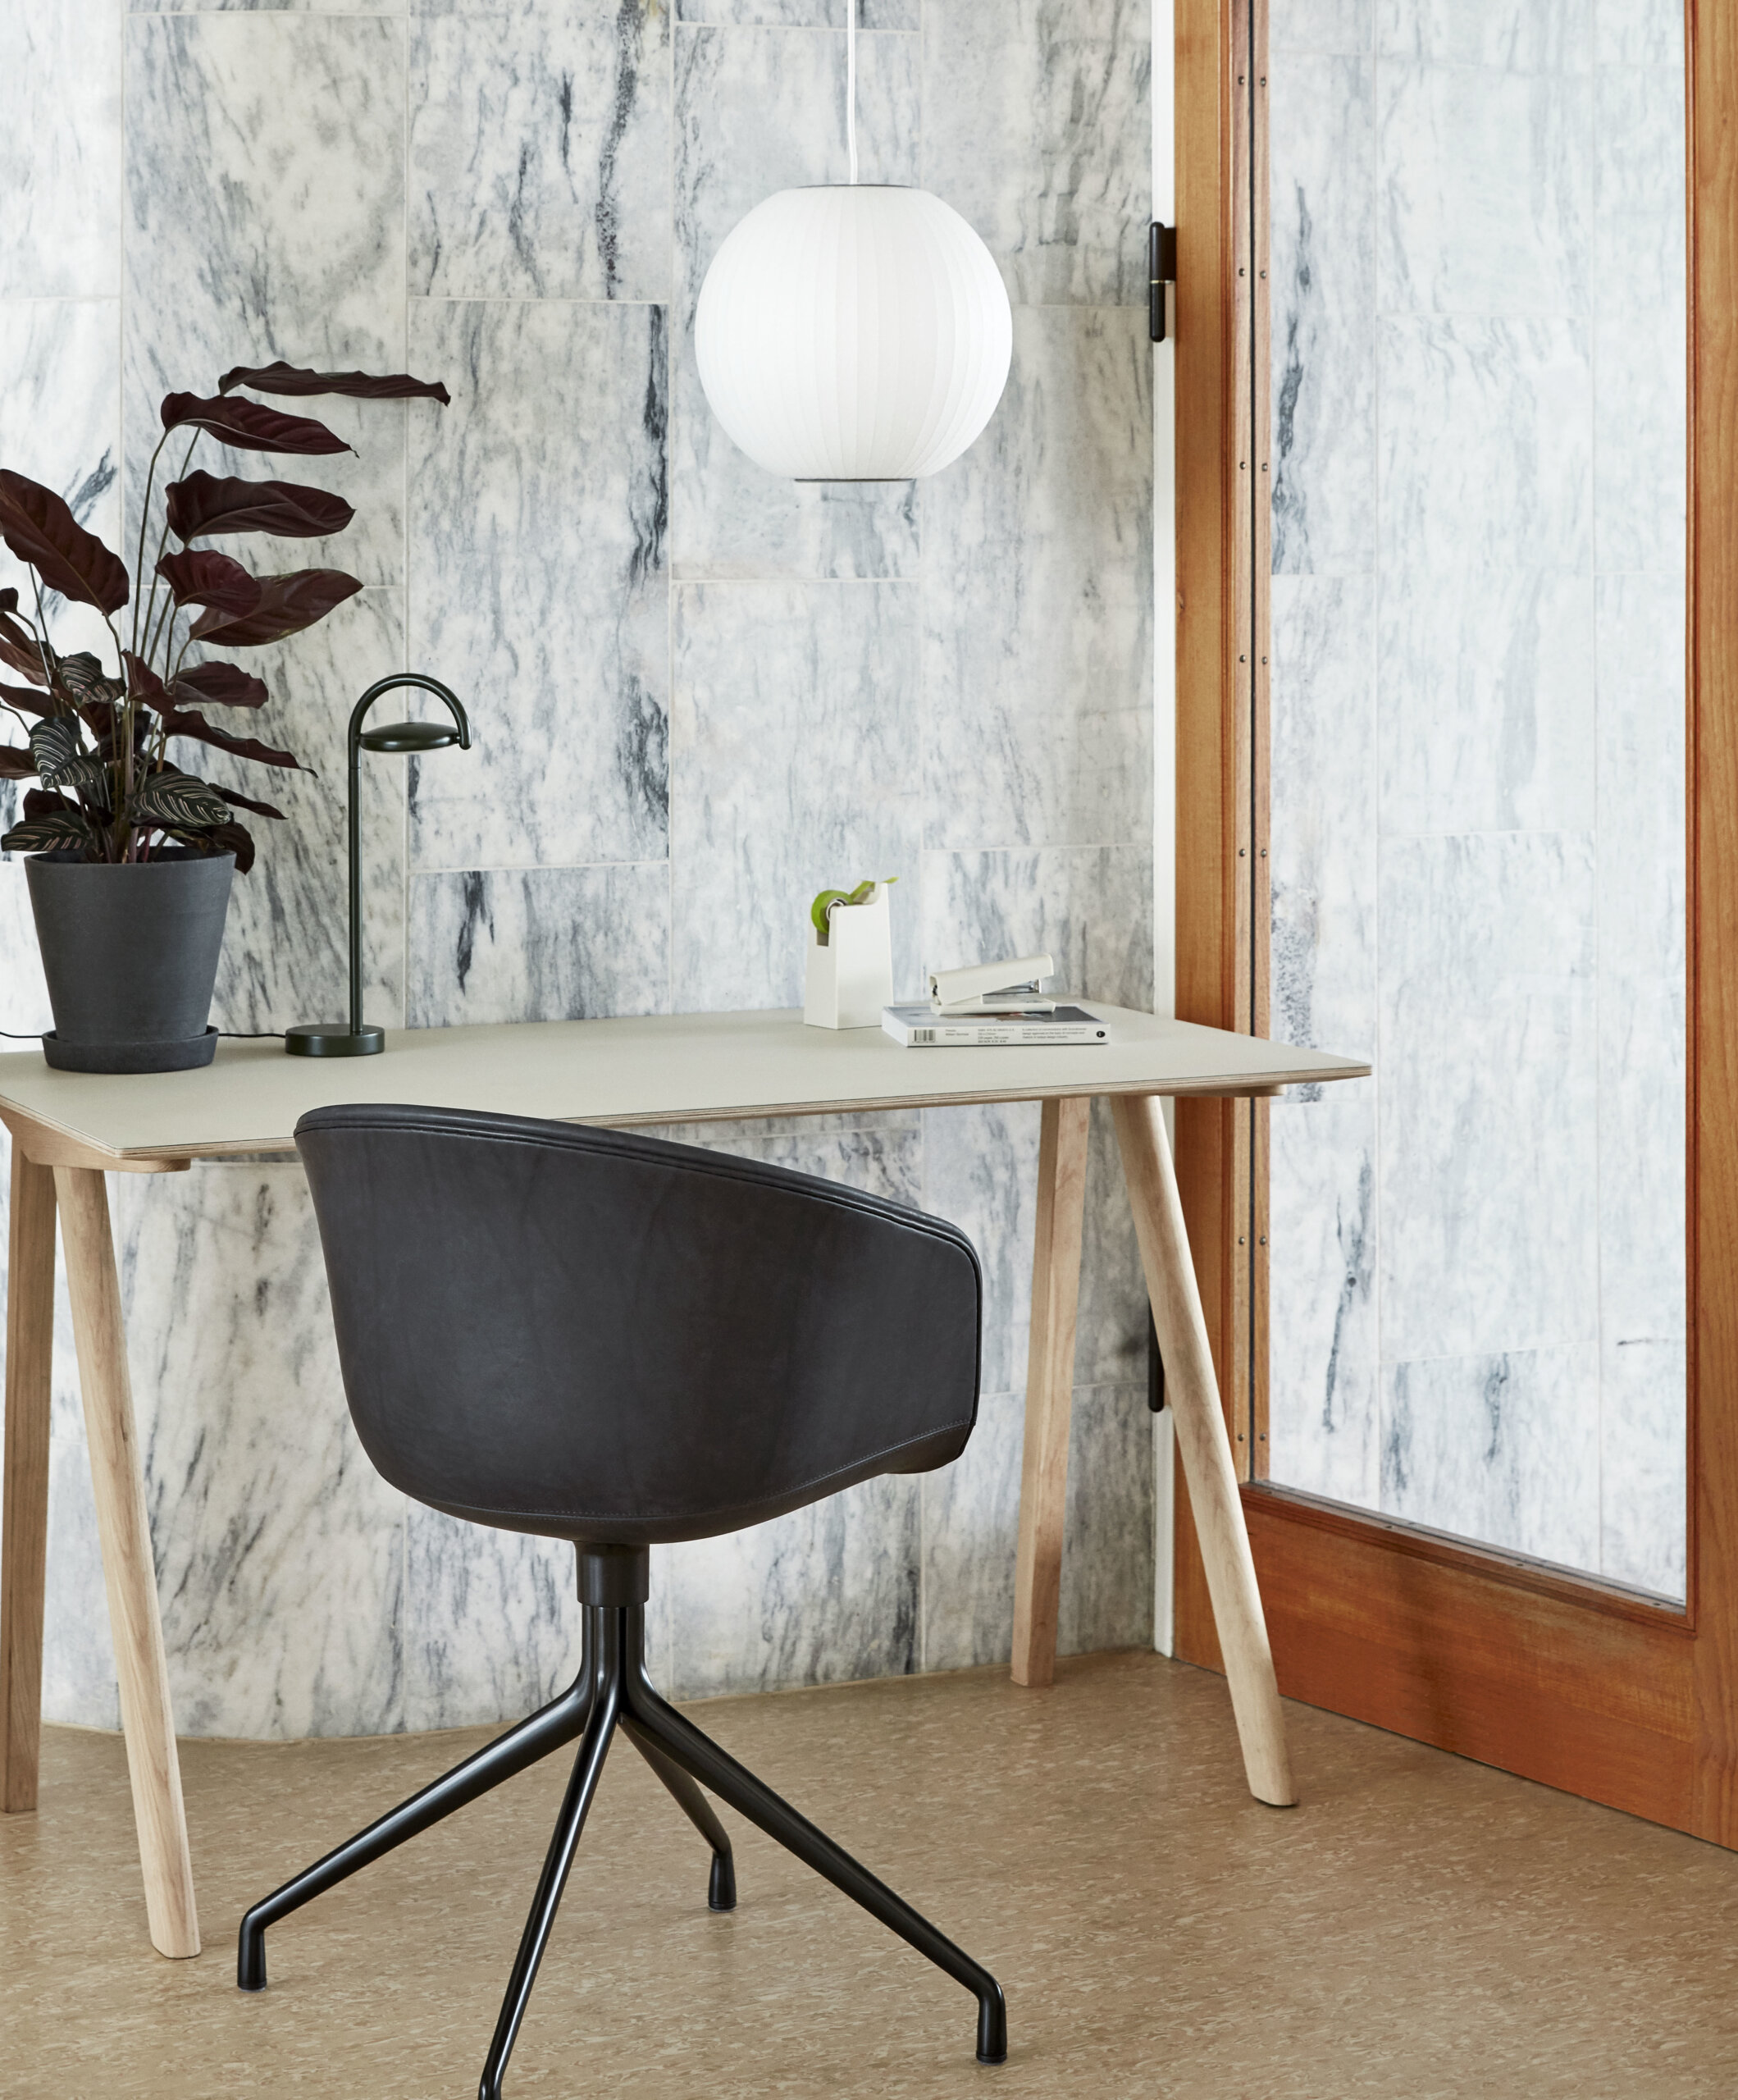 AAC_21_black_base_silk_SIL0842_CPH90_Desk_off_white_linoleum_Bubble_Lamp_Ball_Marselis_Table_Lamp_black.jpg 6